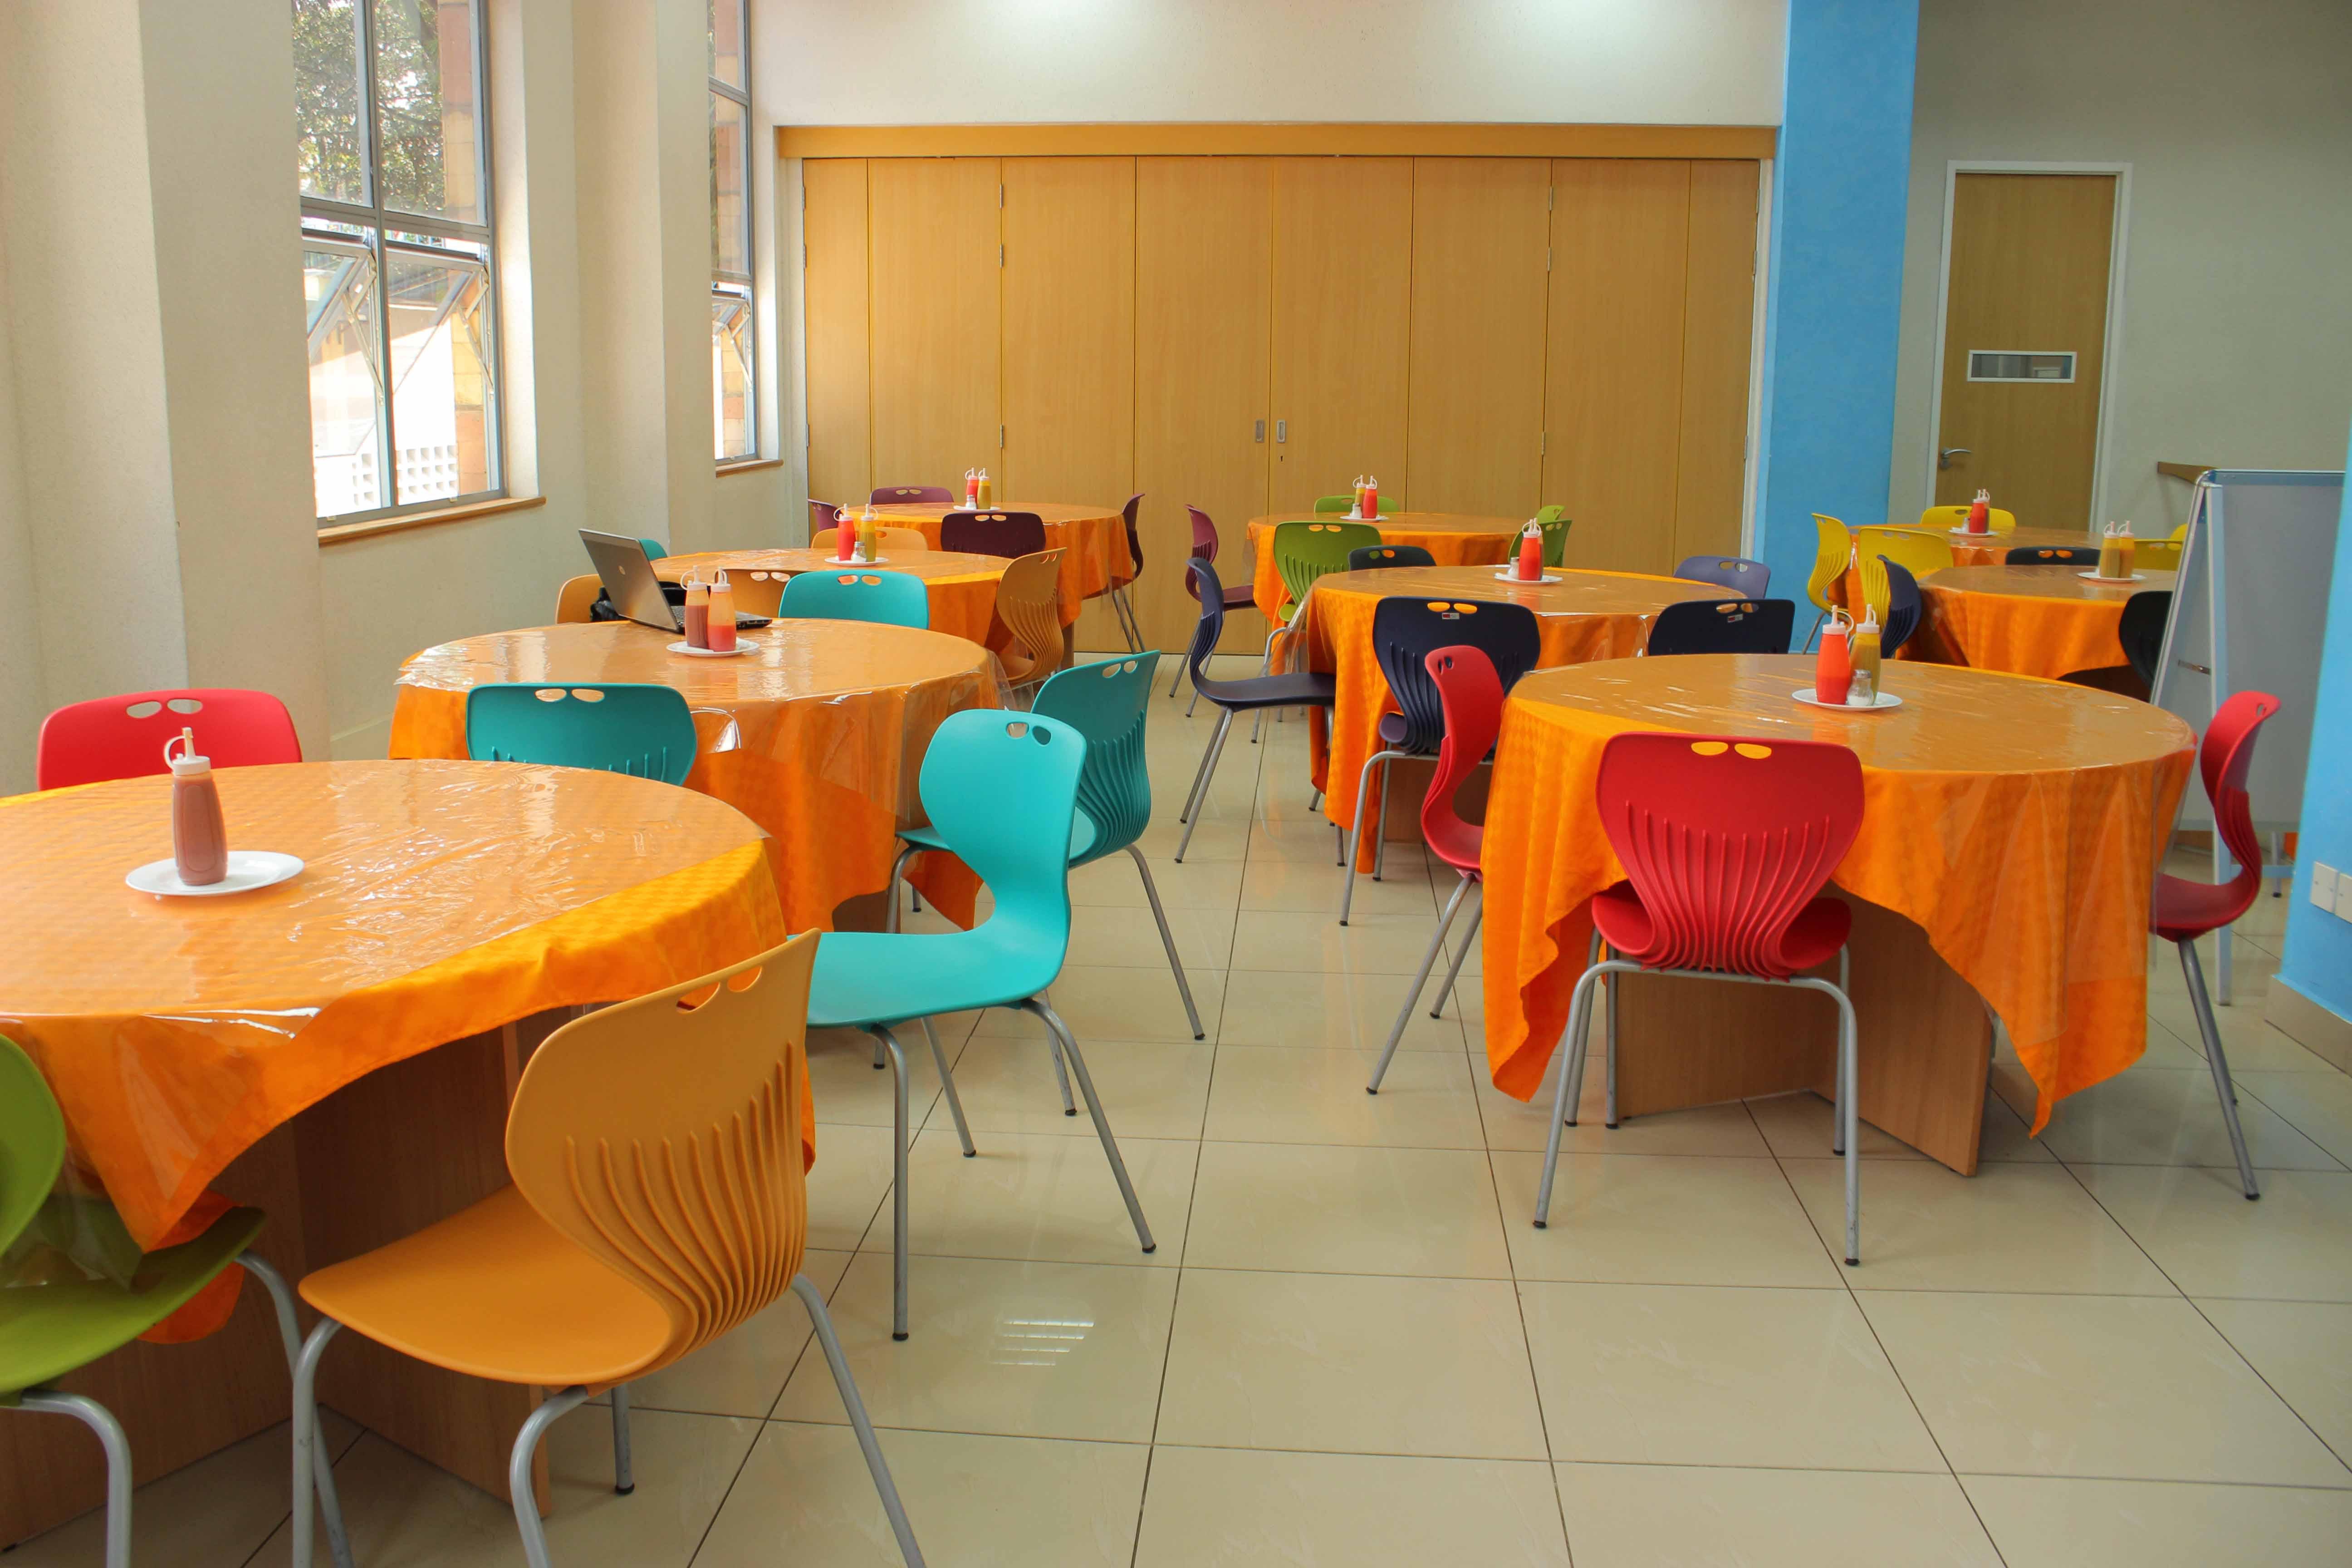 Havey Star Cafe